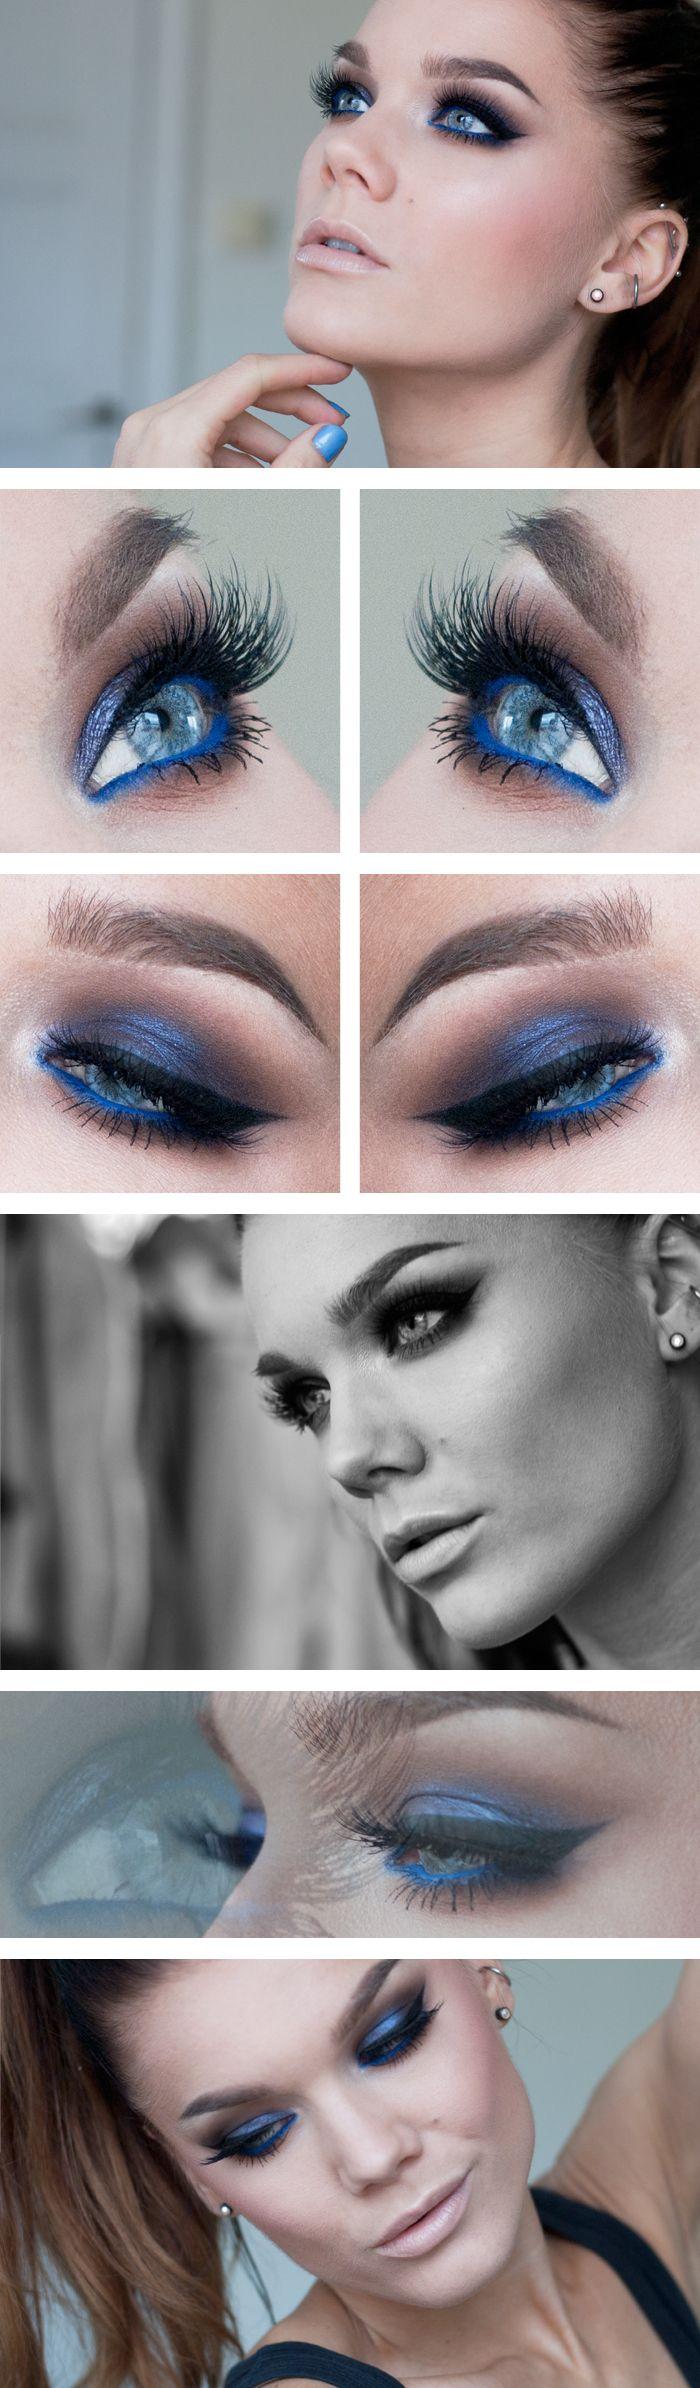 how to use nyx eyeshadow base